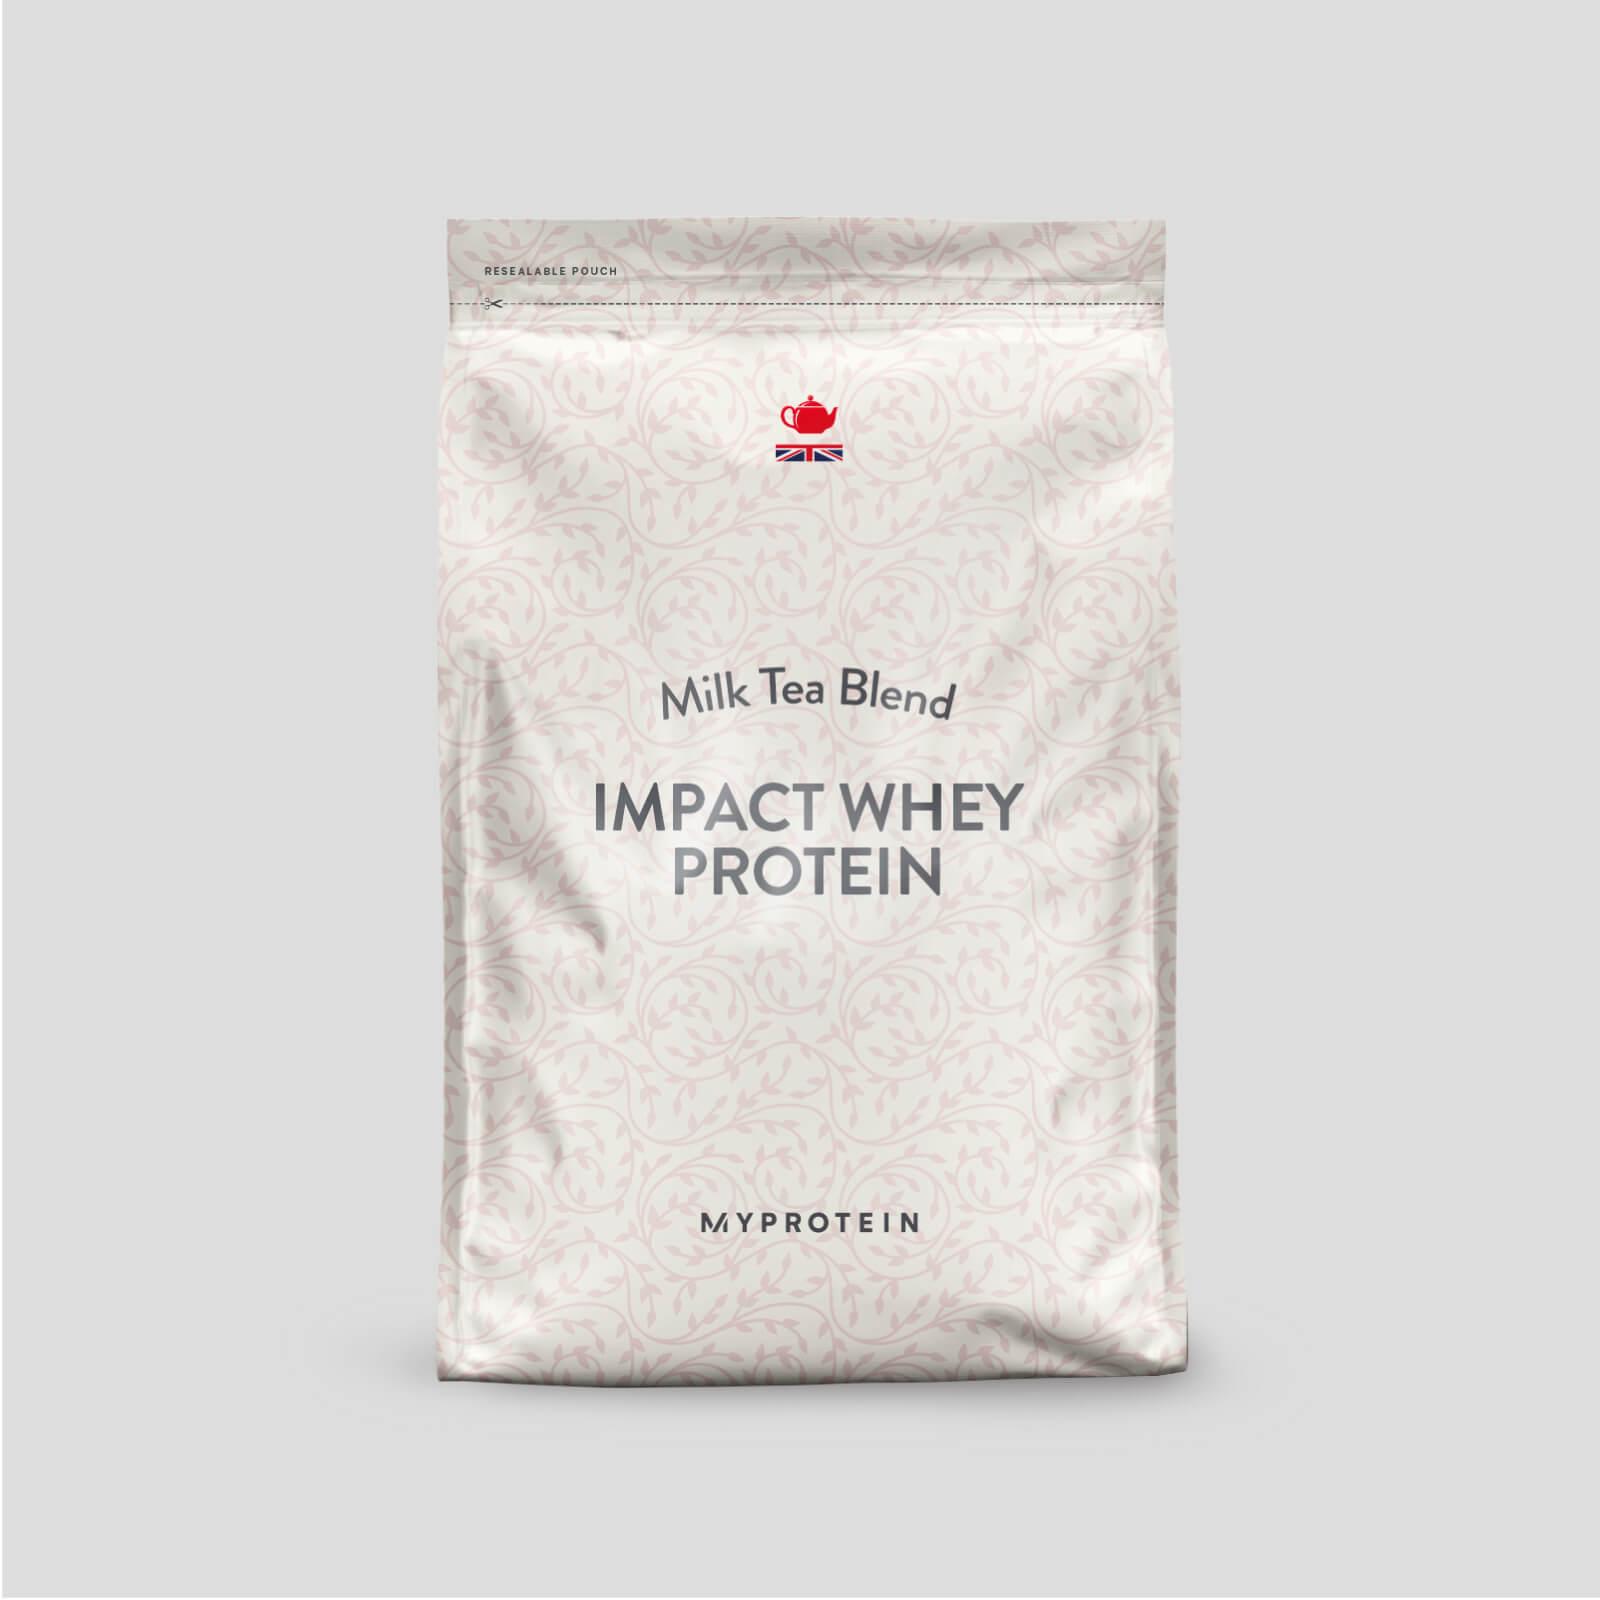 Myprotein Impact Whey Protein - 5kg - Milk Tea